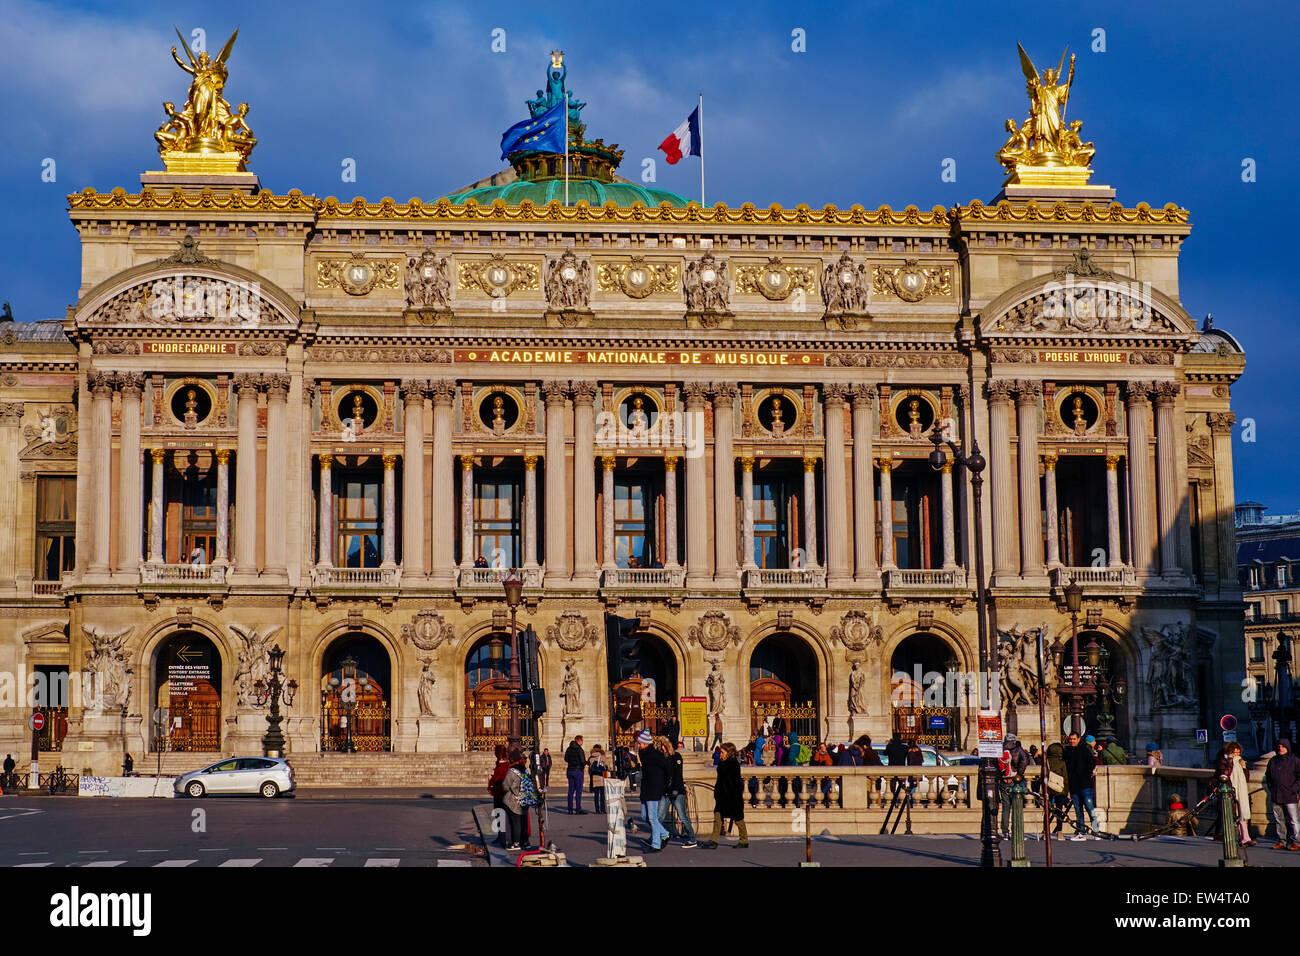 France, Paris, Garnier Opera - Stock Image